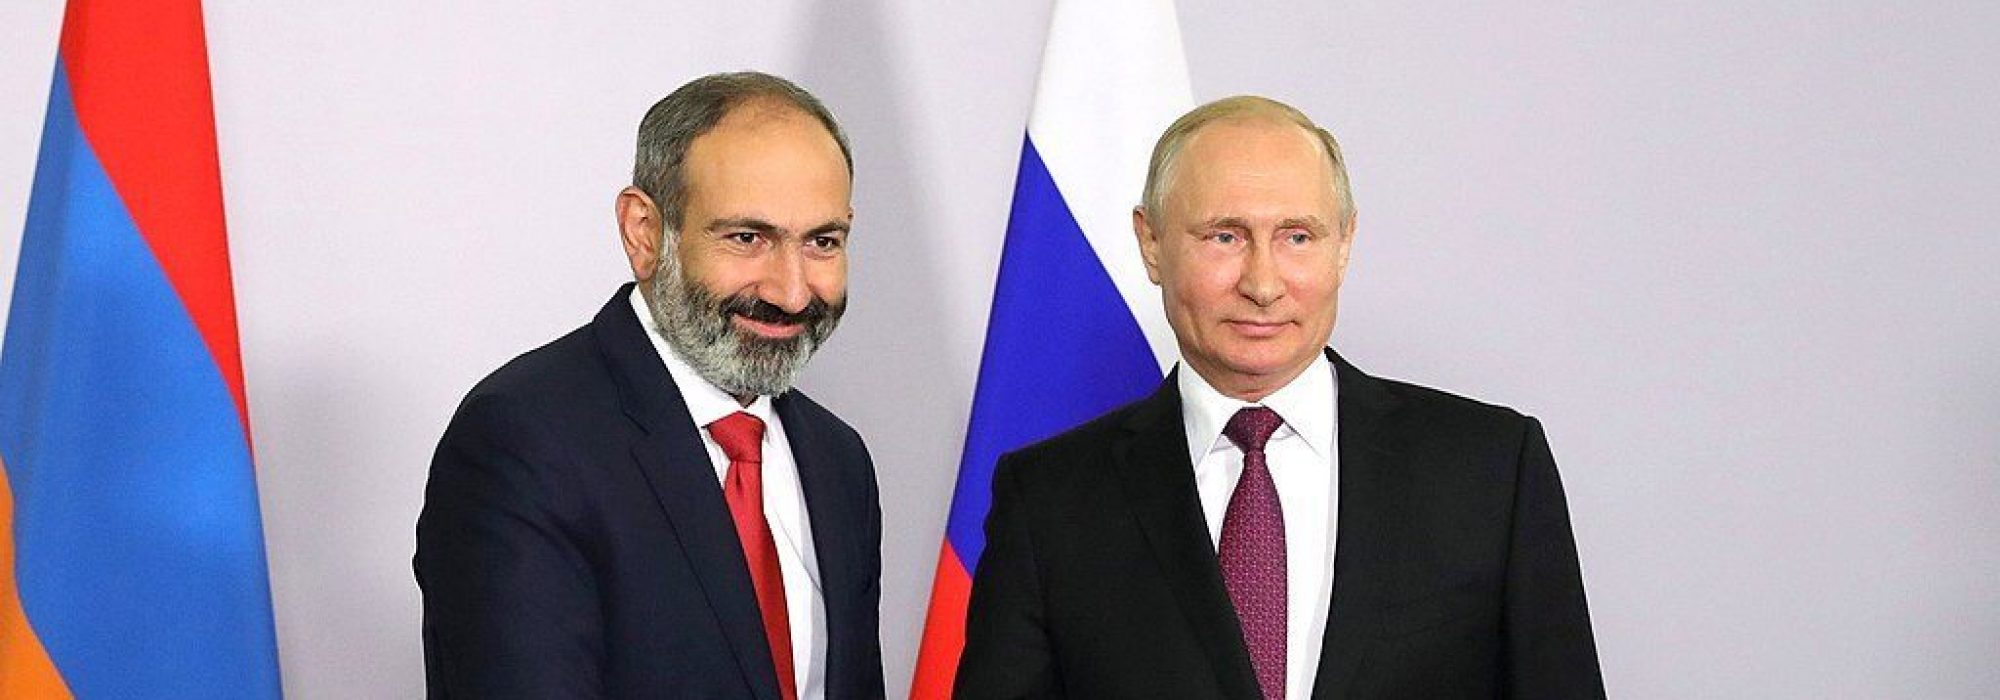 1024px-Vladimir_Putin_and_Nikol_Pashinyan_(2018-05-14)_02